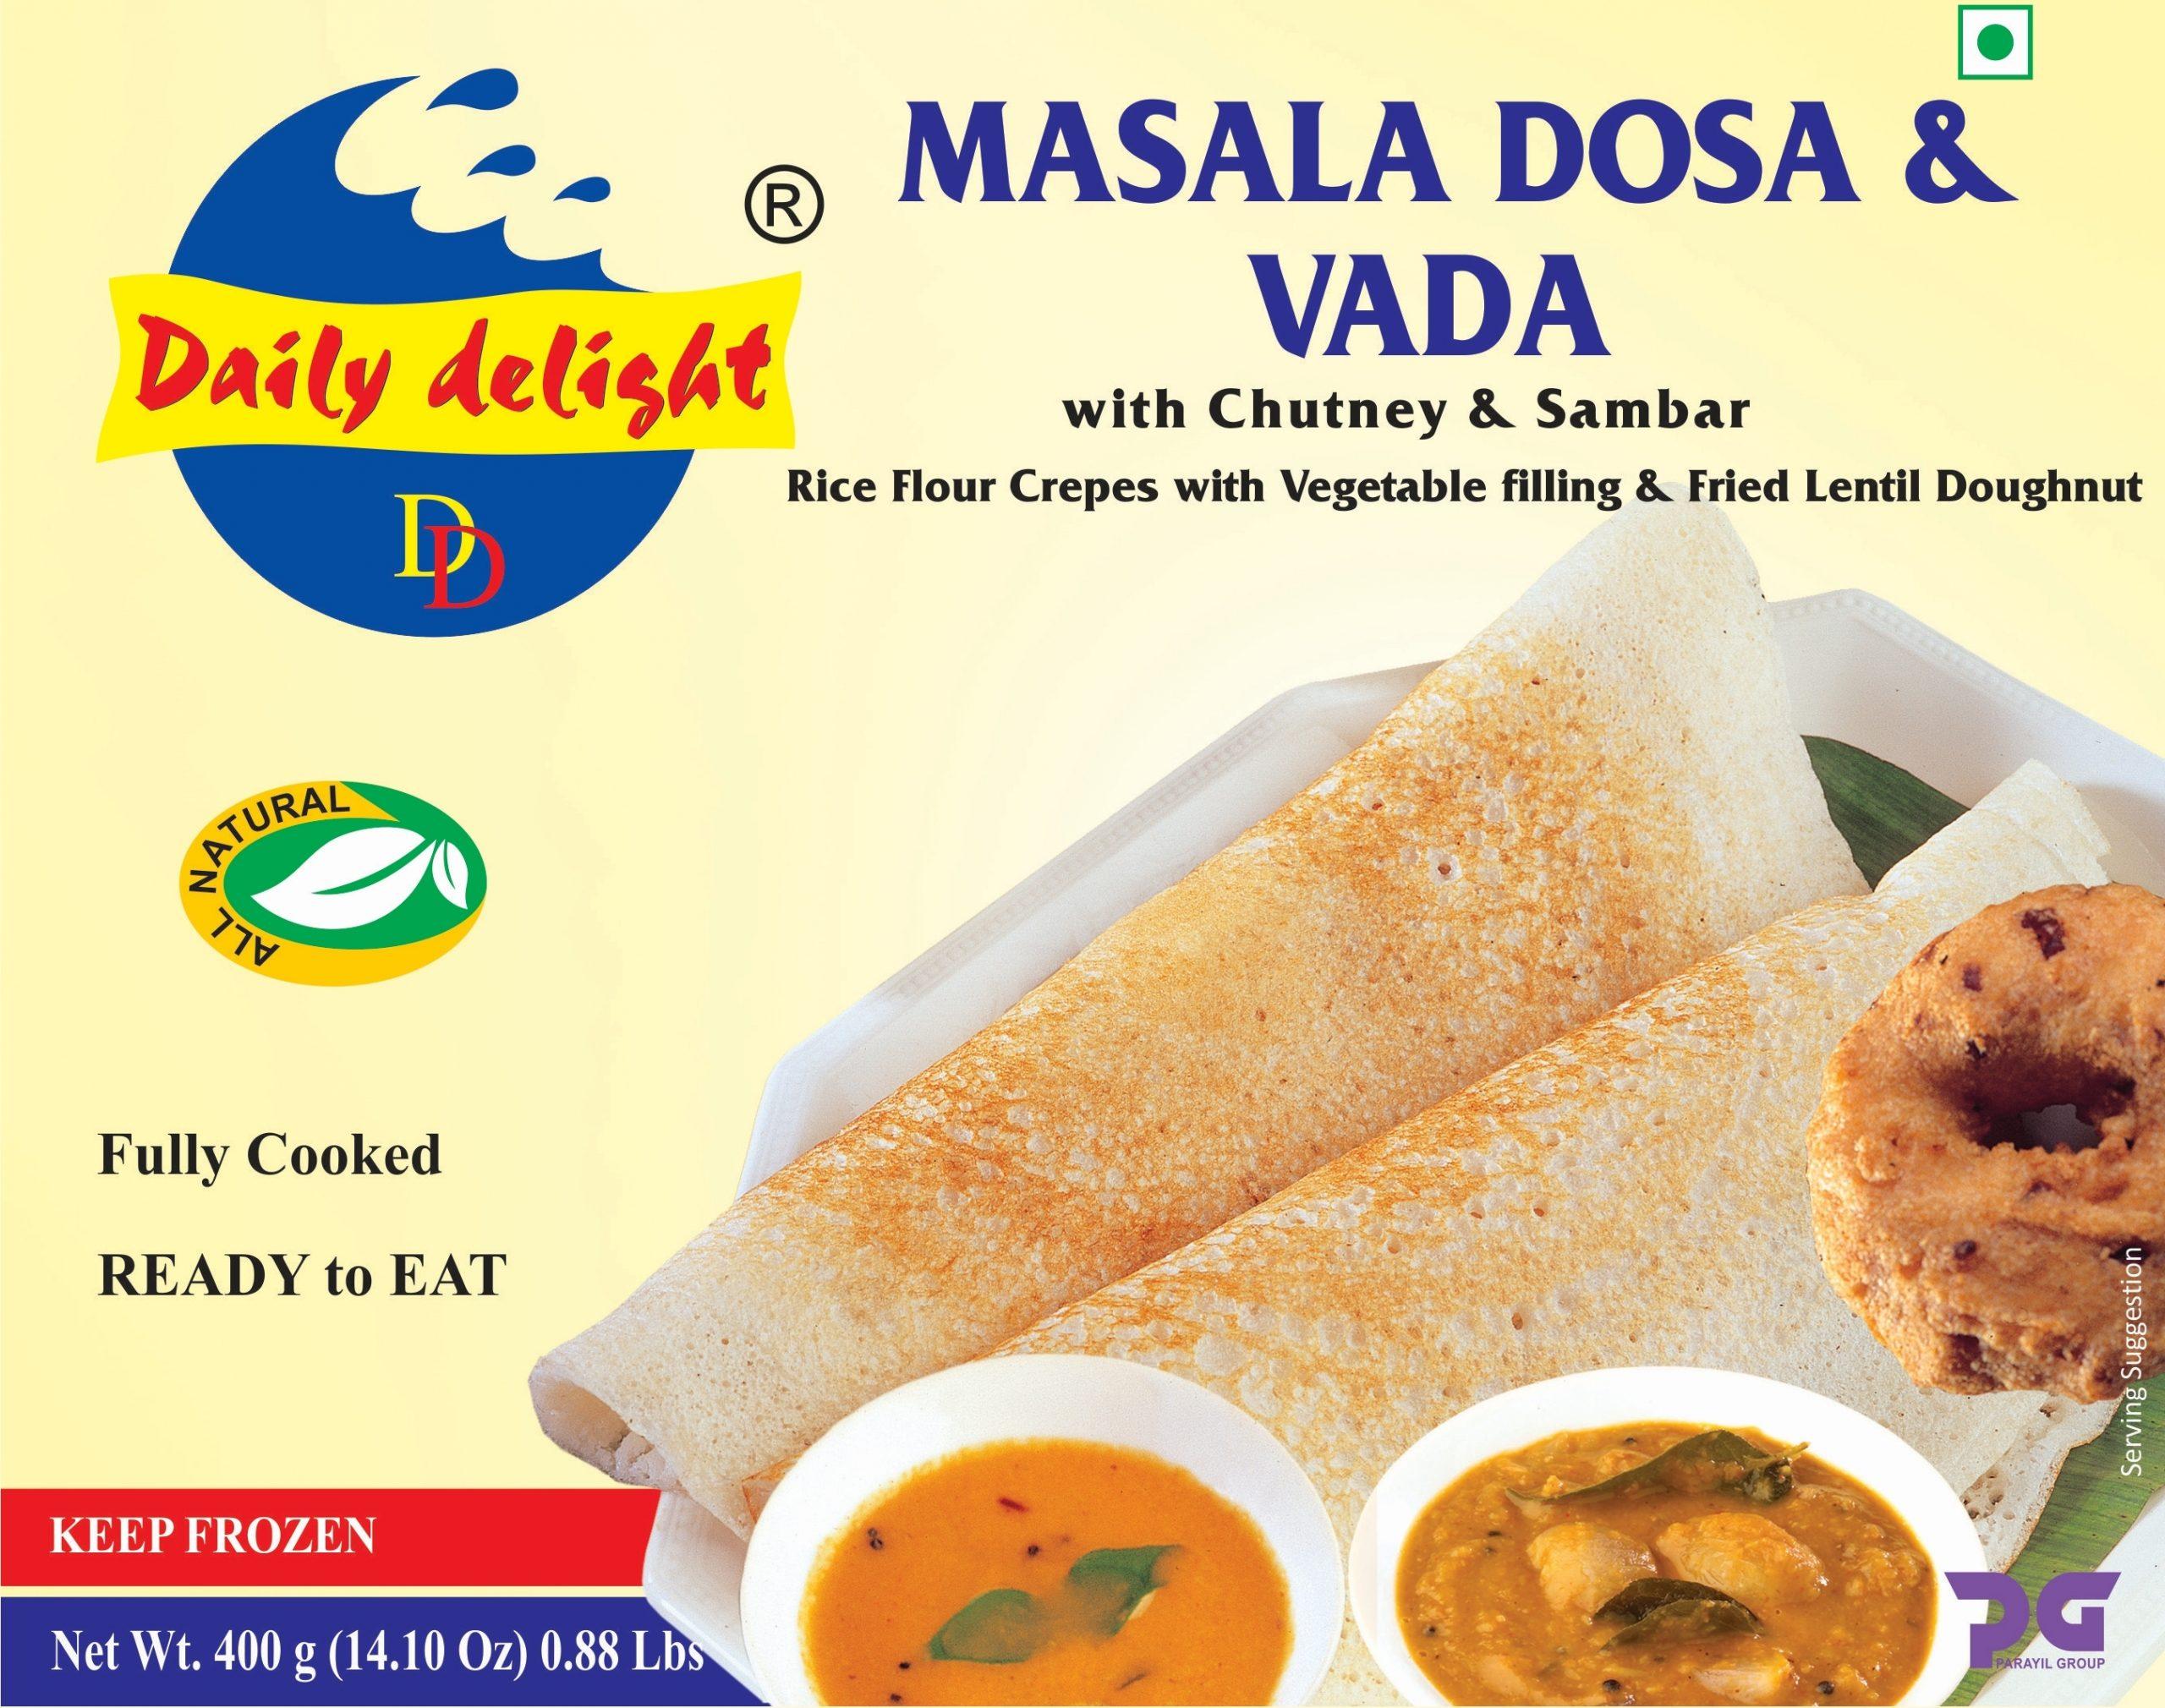 Daily Delight Masala Dosa and Vada